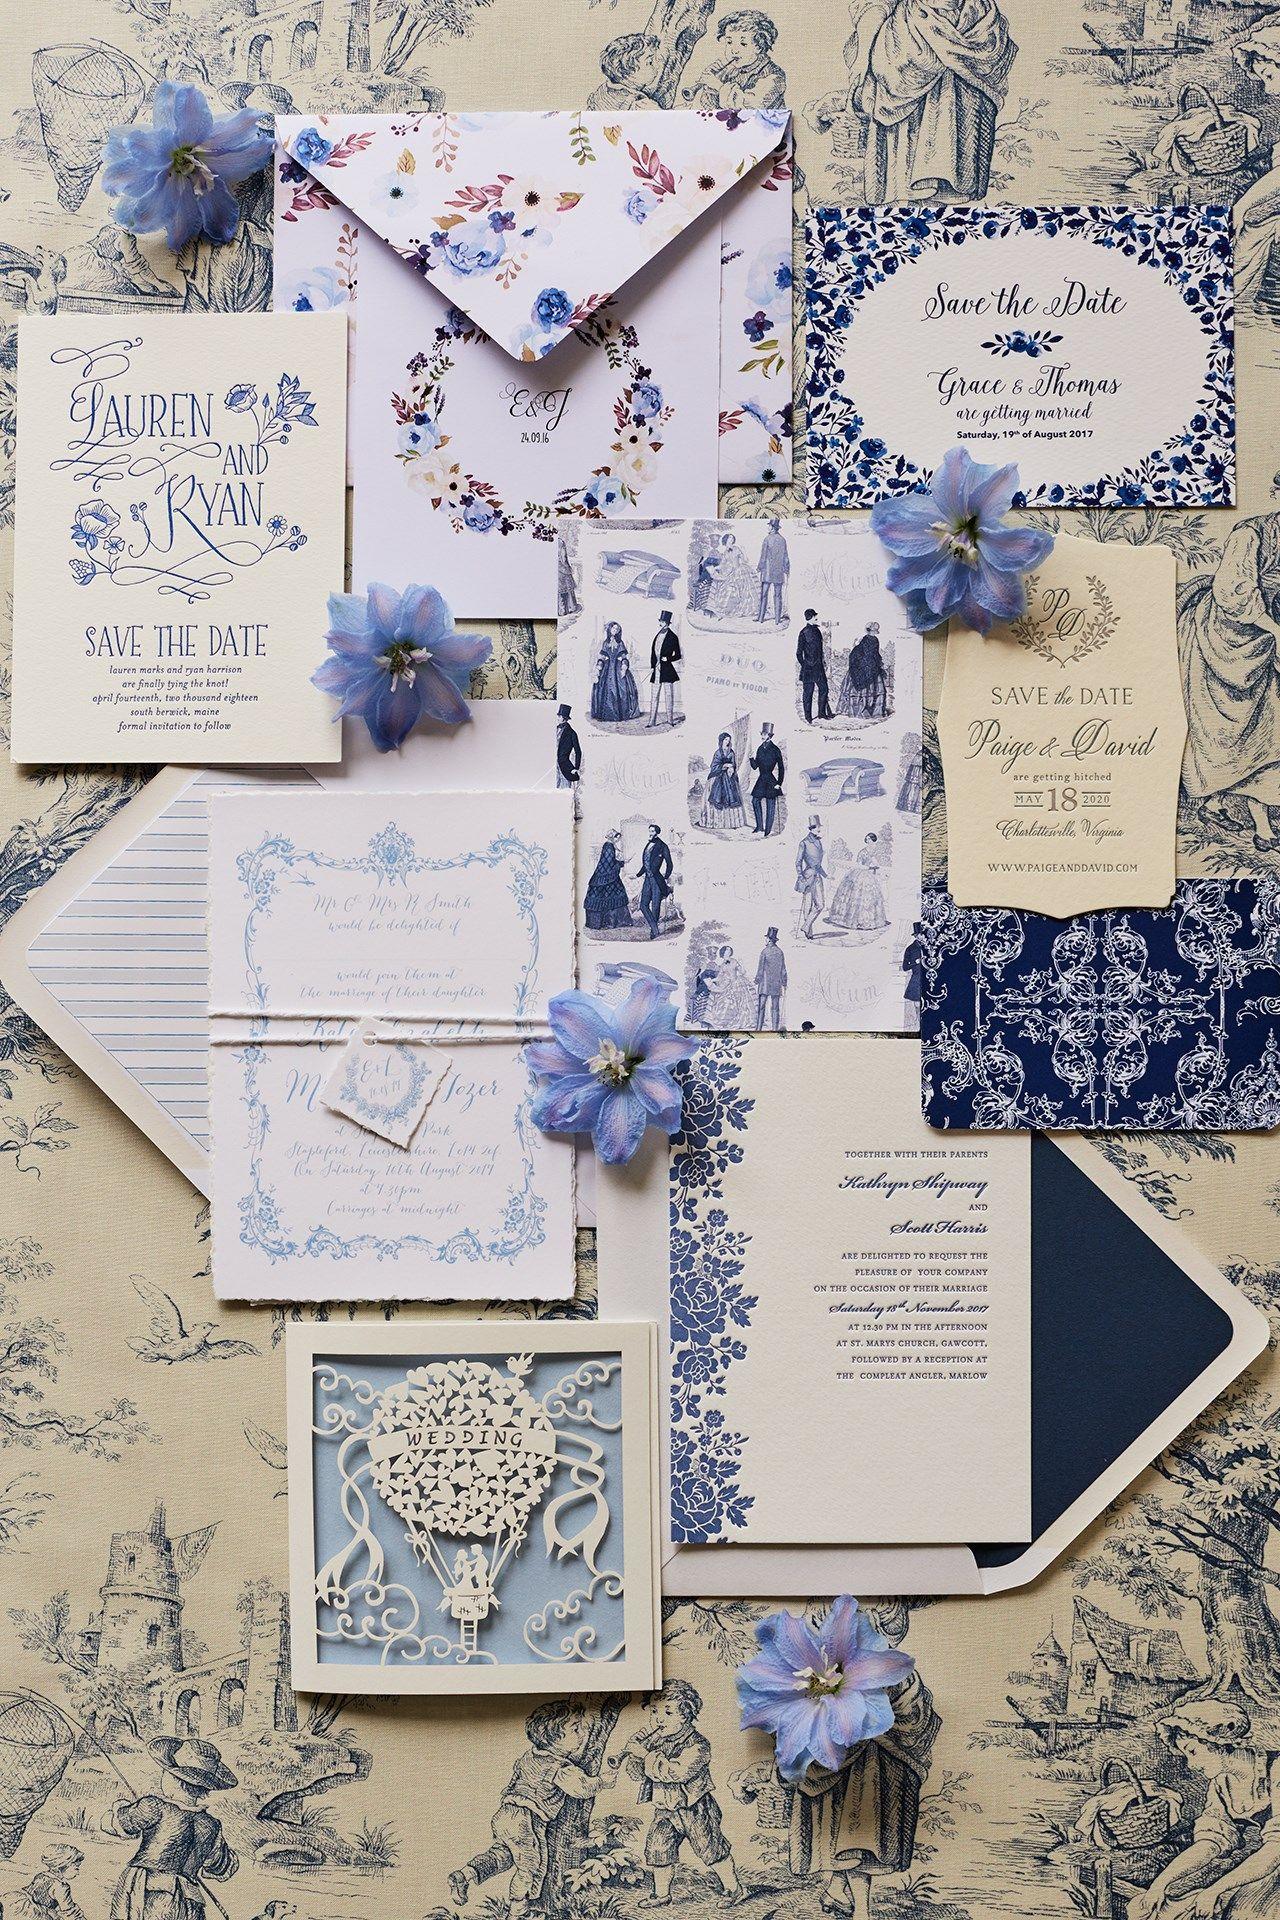 The Ultimate Blue And White Wedding Theme | Pinterest | Theme ideas ...